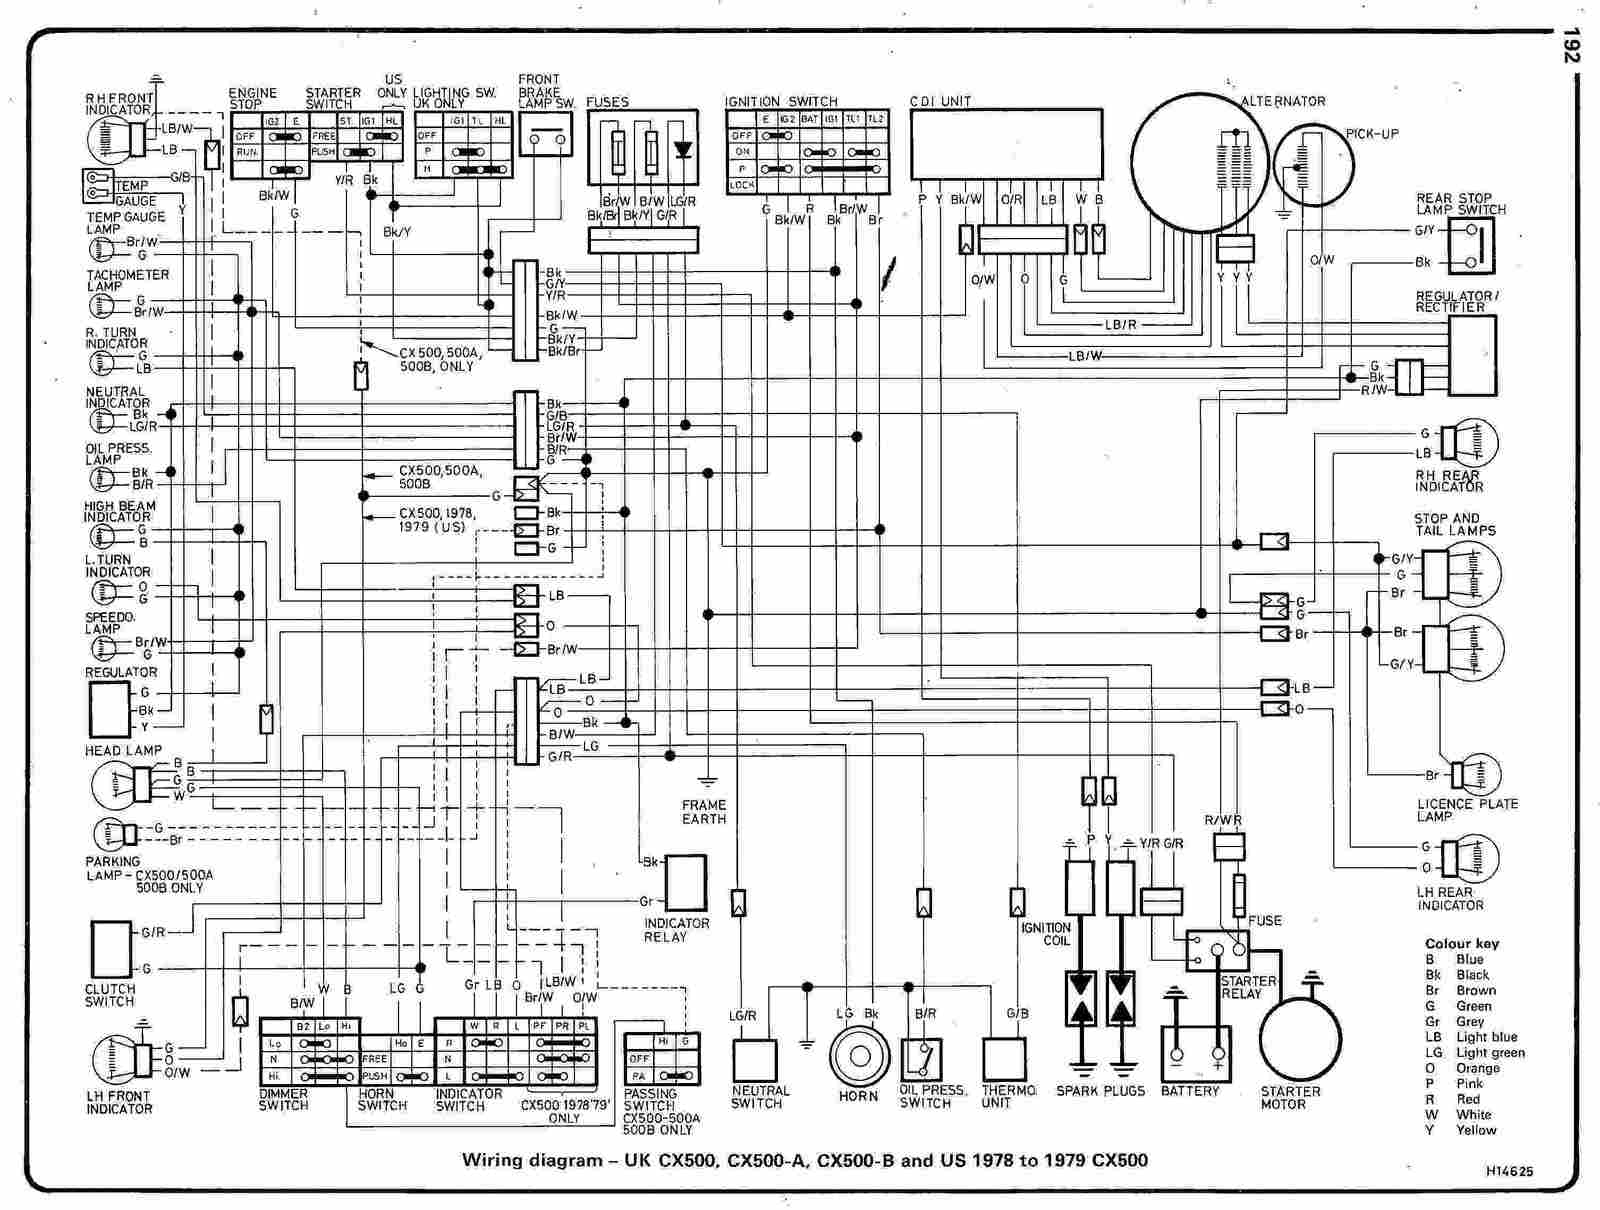 1979 jeep cj5 wiring diagram 2005 tj stereo 1978 harness free engine